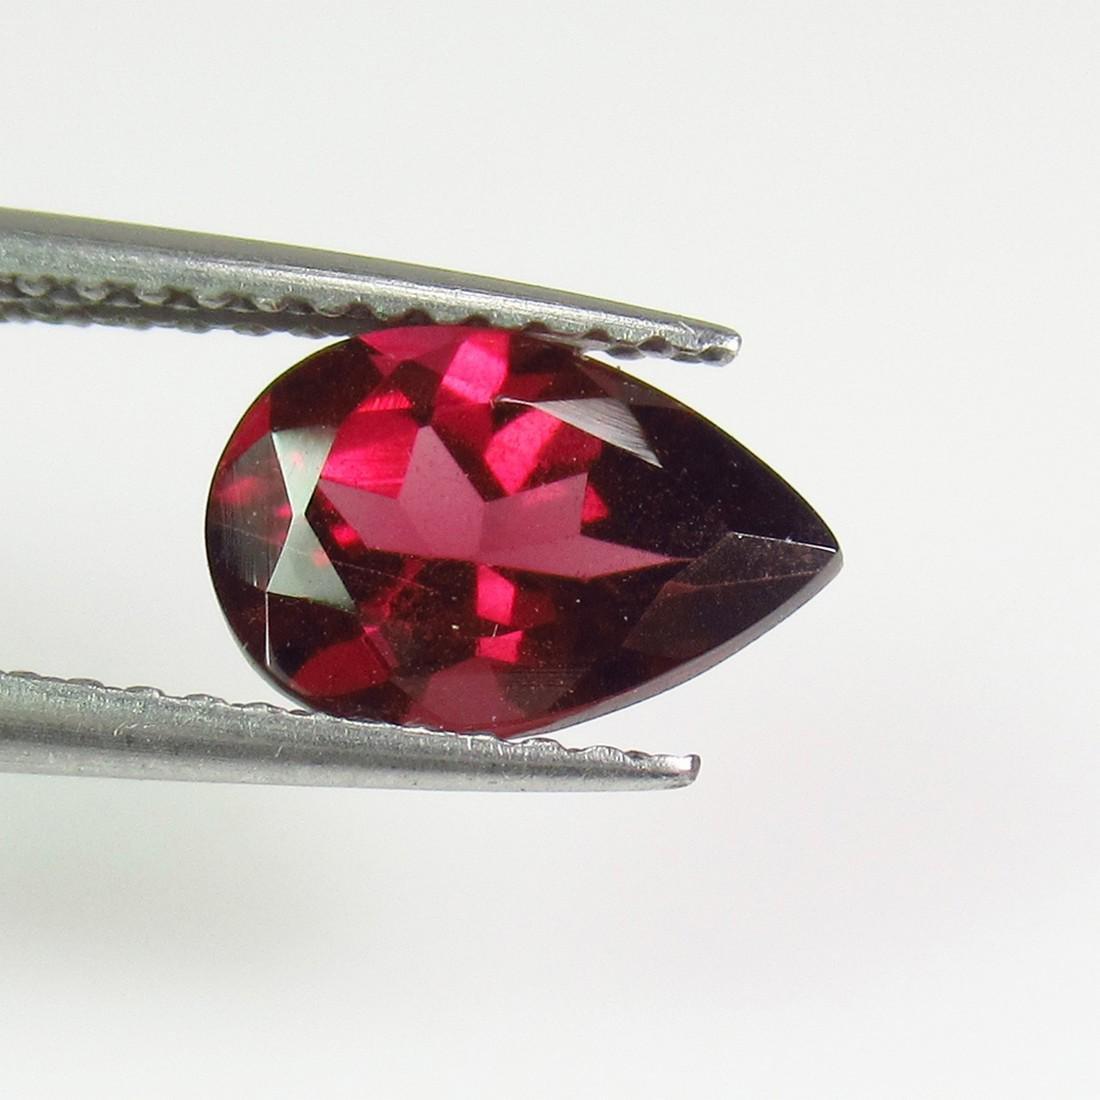 1.66 Ctw Natural Pink Rhodolite Garnet 9X6 mm Pear Cut